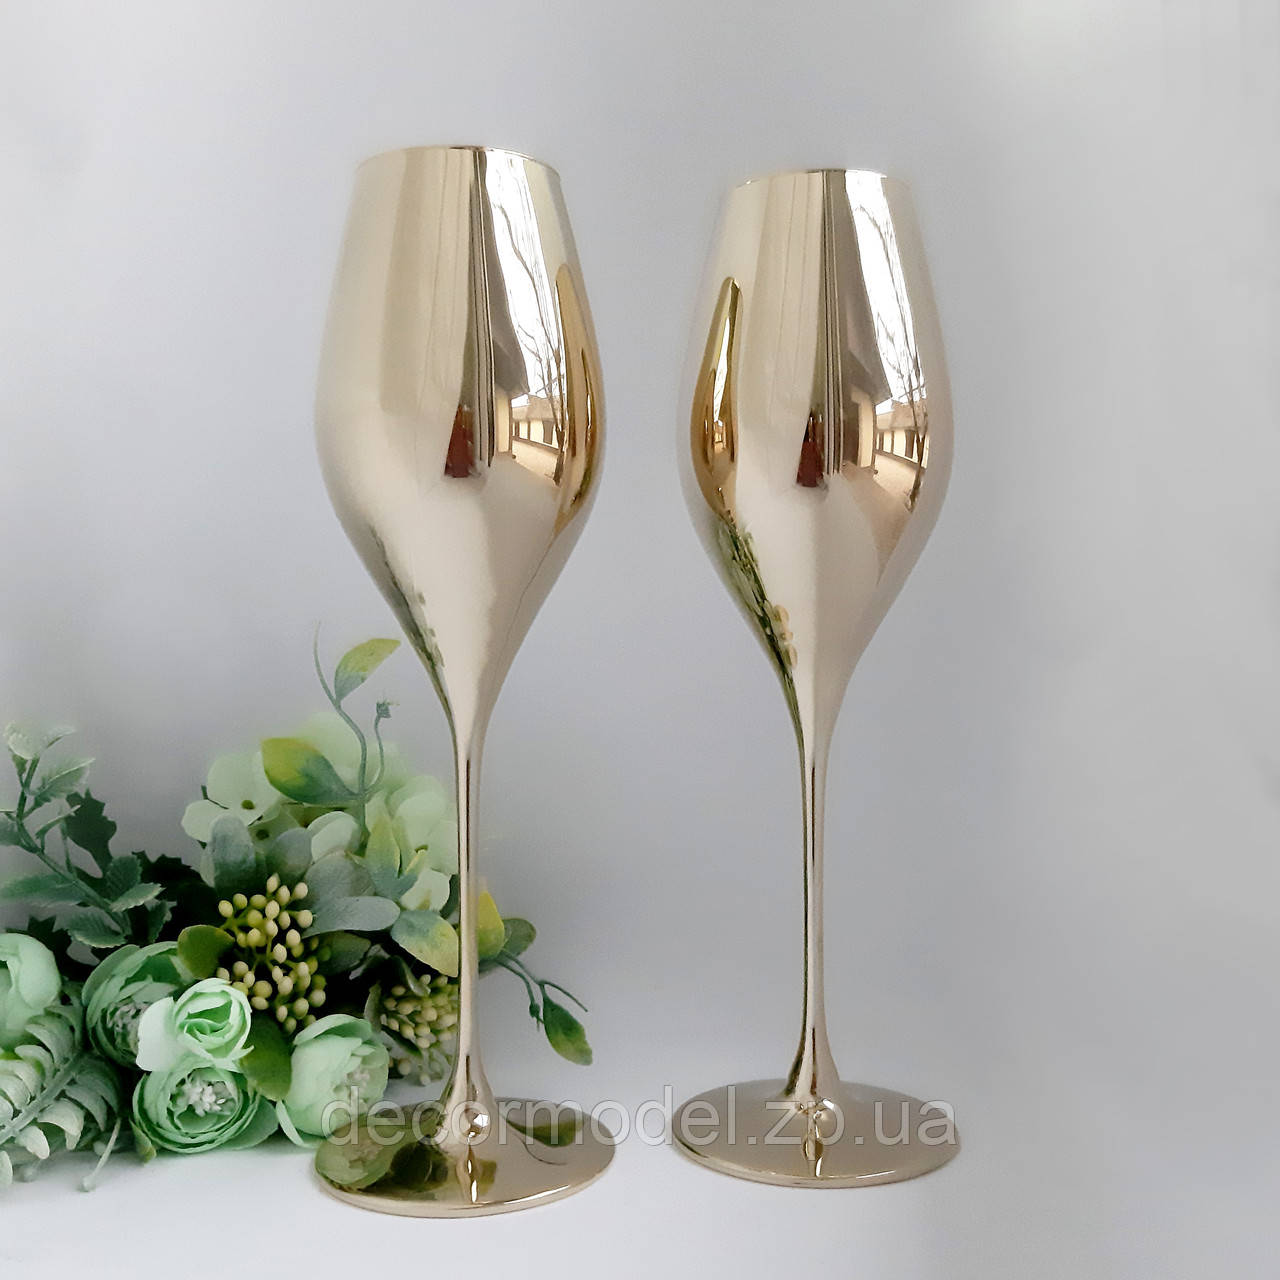 Набор бокалов для шампанского Rona Swan 320 мл 6 шт золото